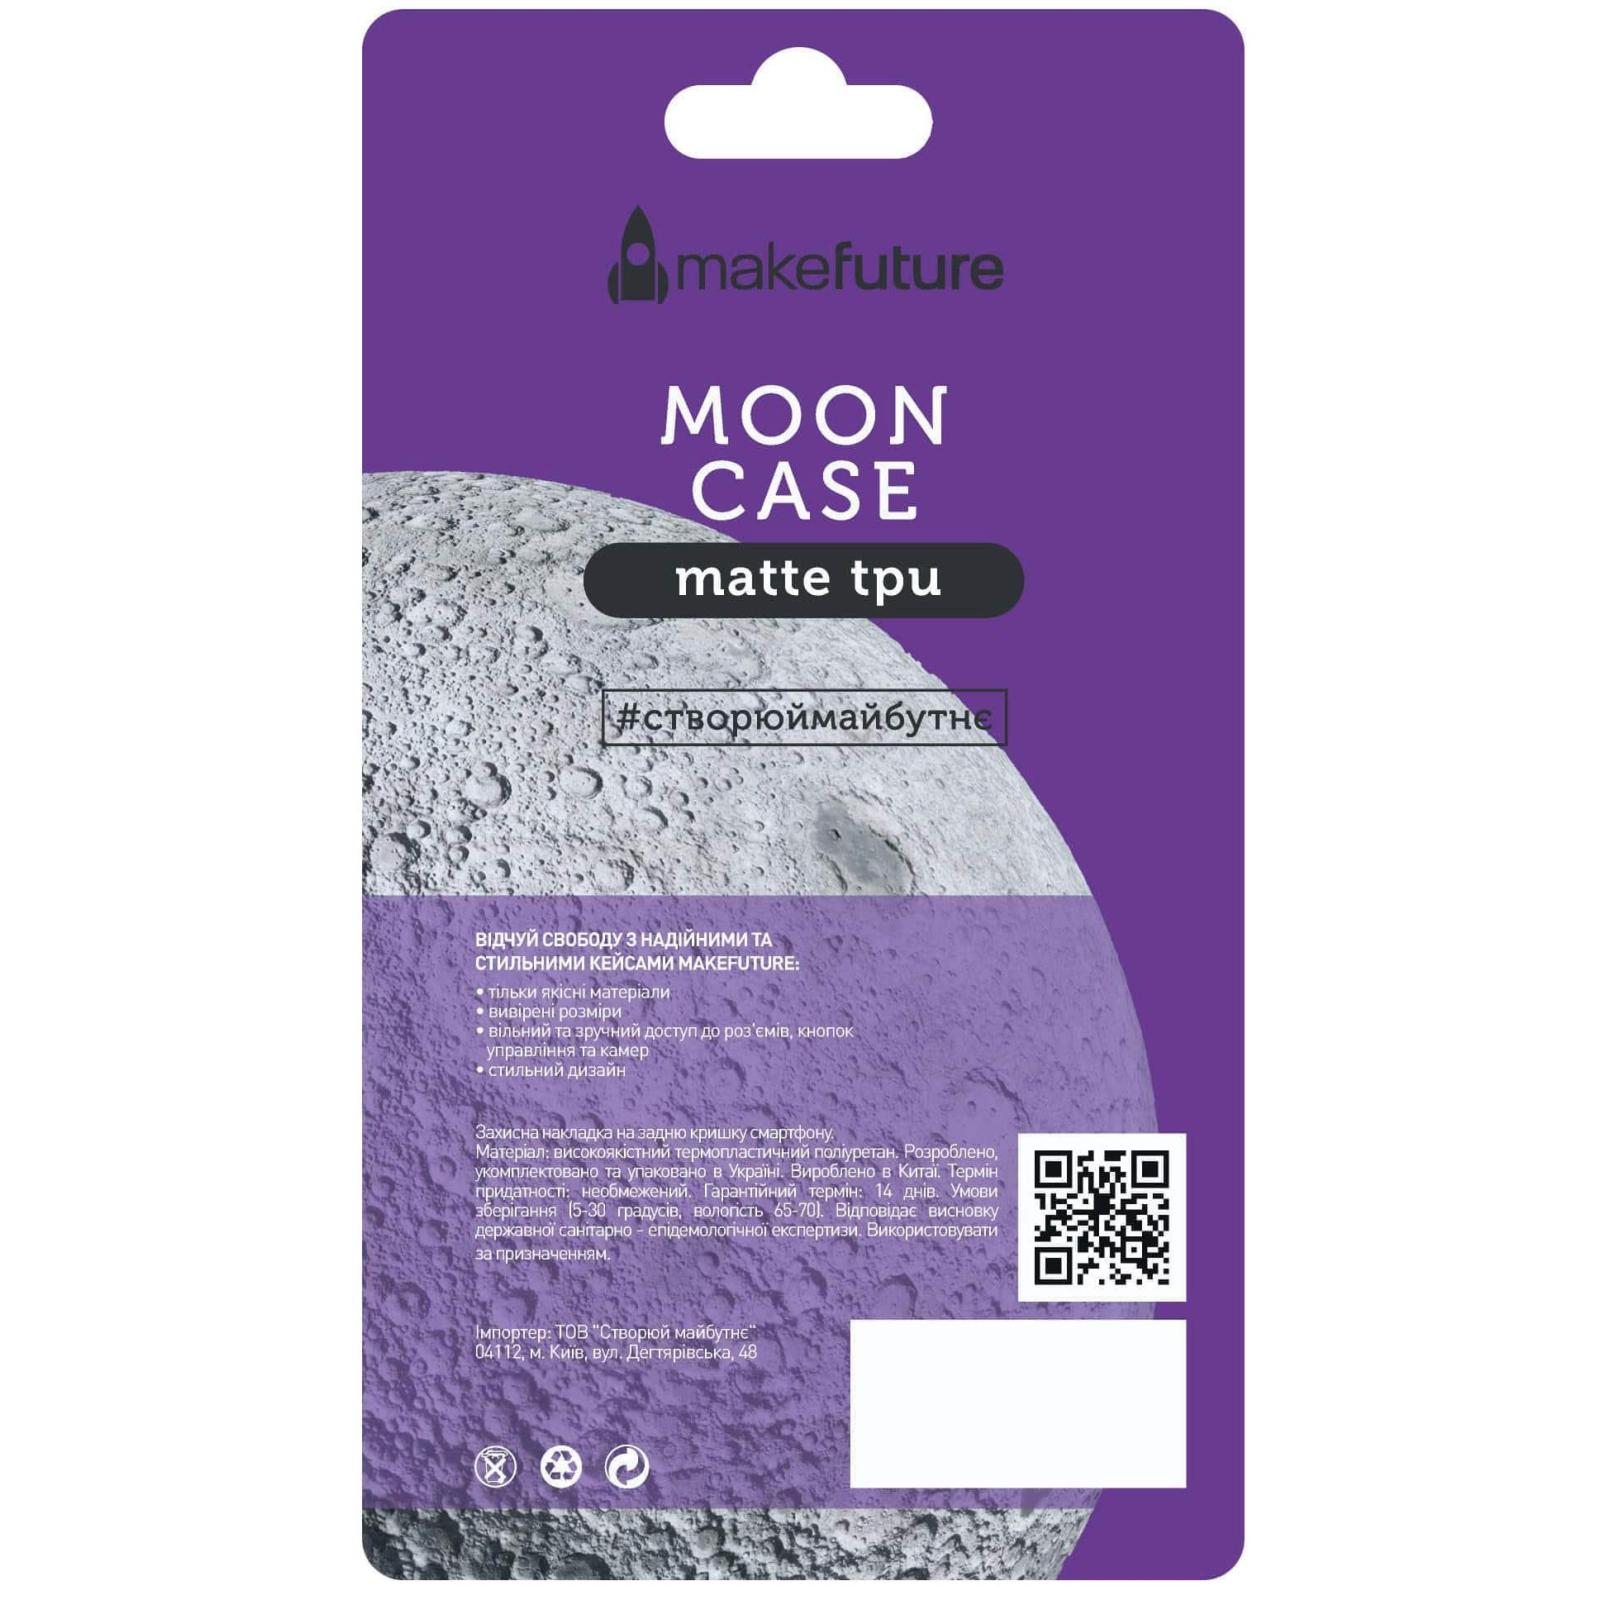 Чехол для моб. телефона MakeFuture Moon Case (TPU) Samsung J4 2018 Black (MCM-SJ400BK) изображение 2